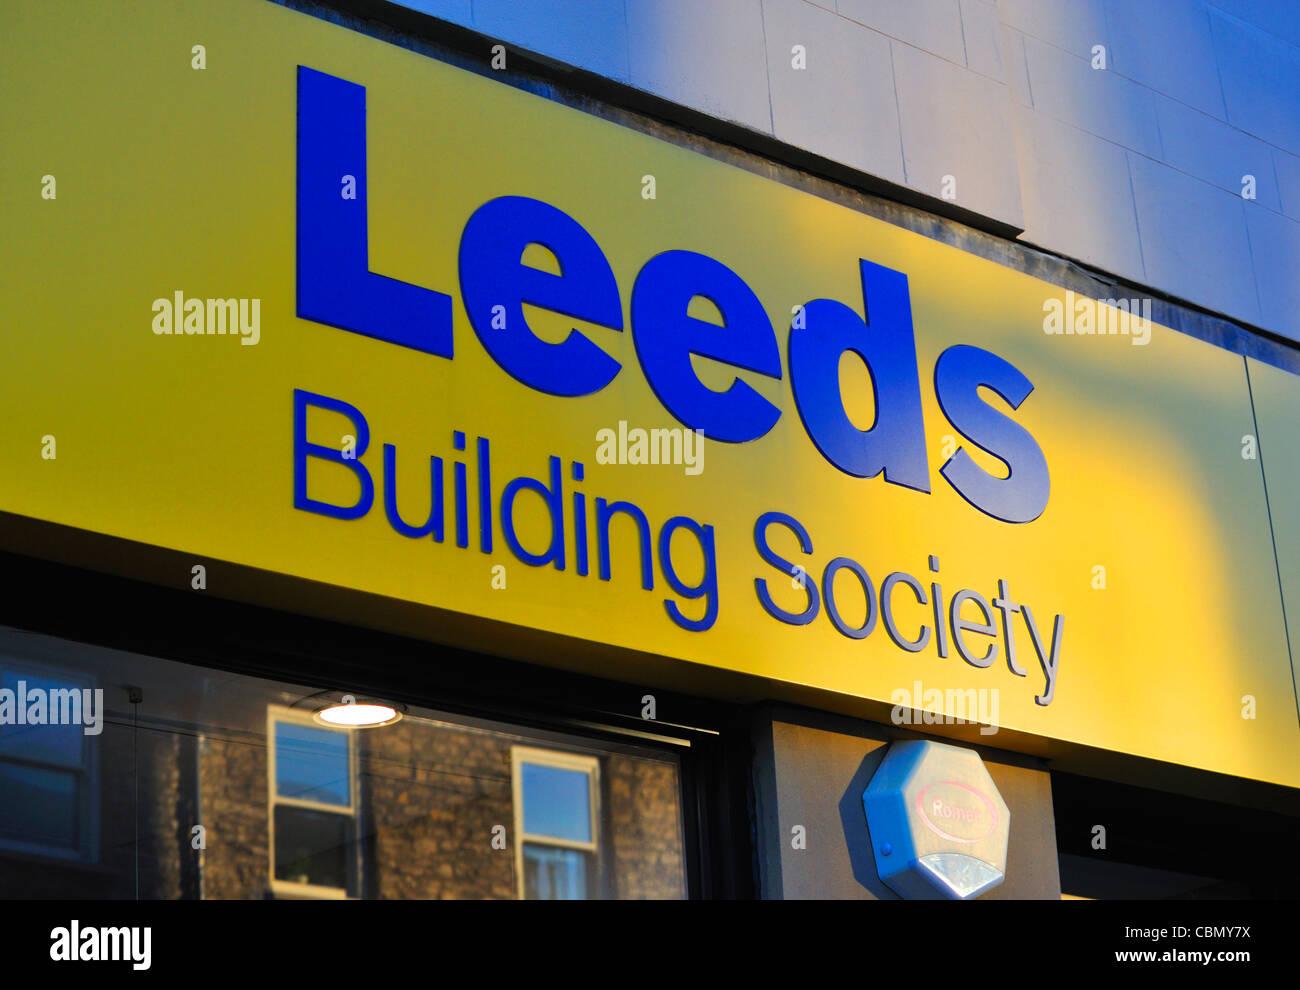 leeds-building-society-logo-stricklandgate-kendal-cumbria-england-CBMY7X.jpg